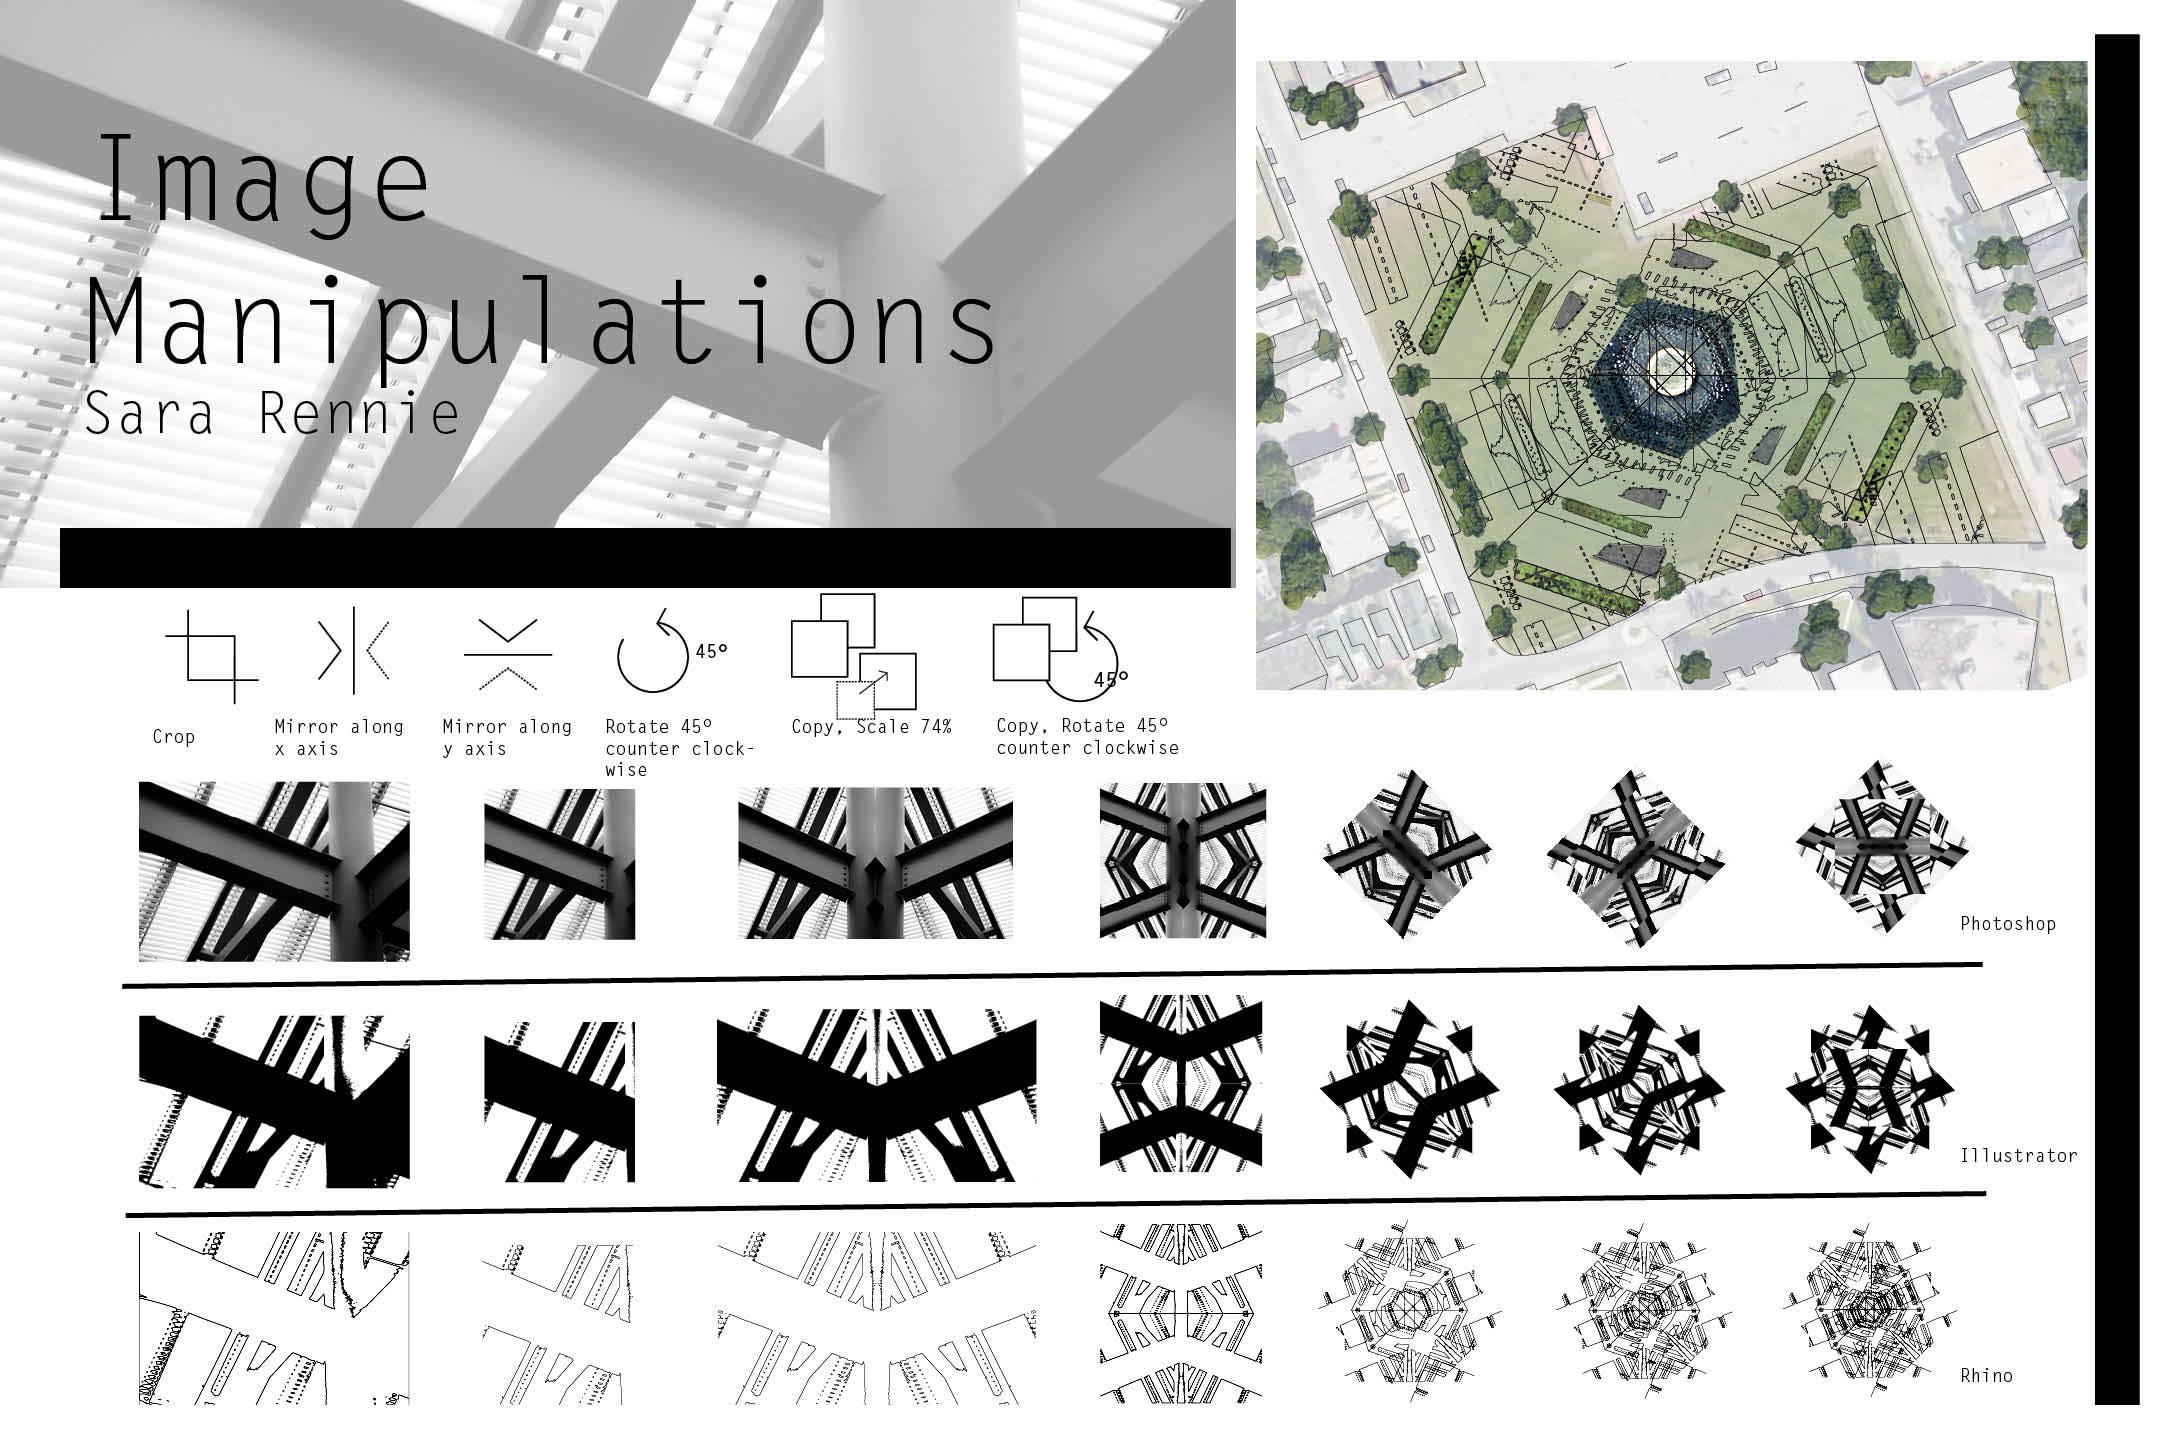 image-manipulations-2